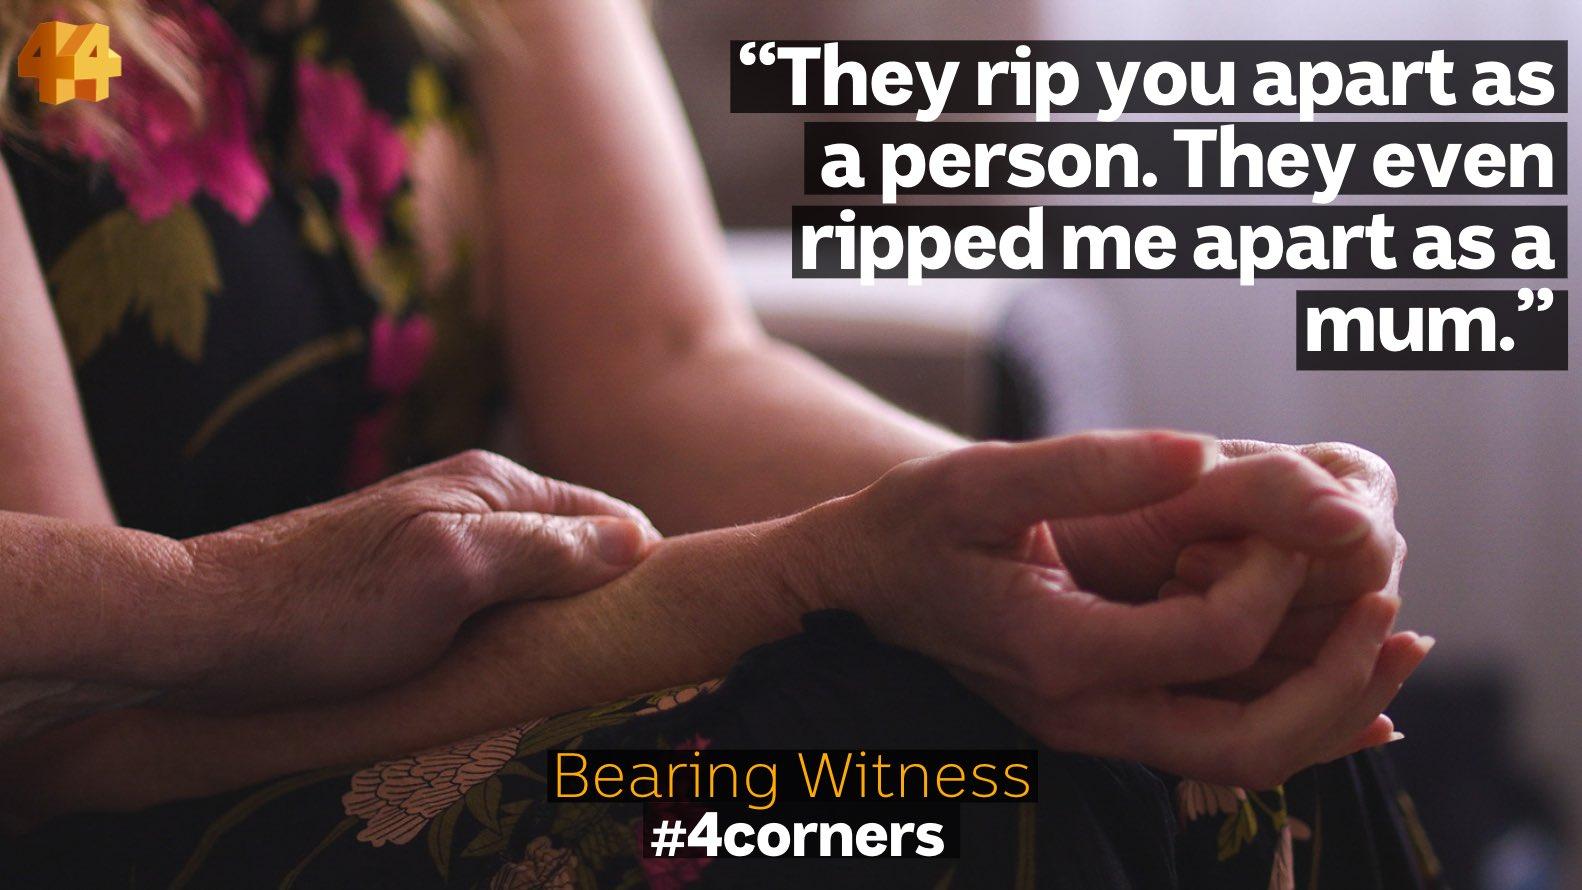 #4Corners Twitter